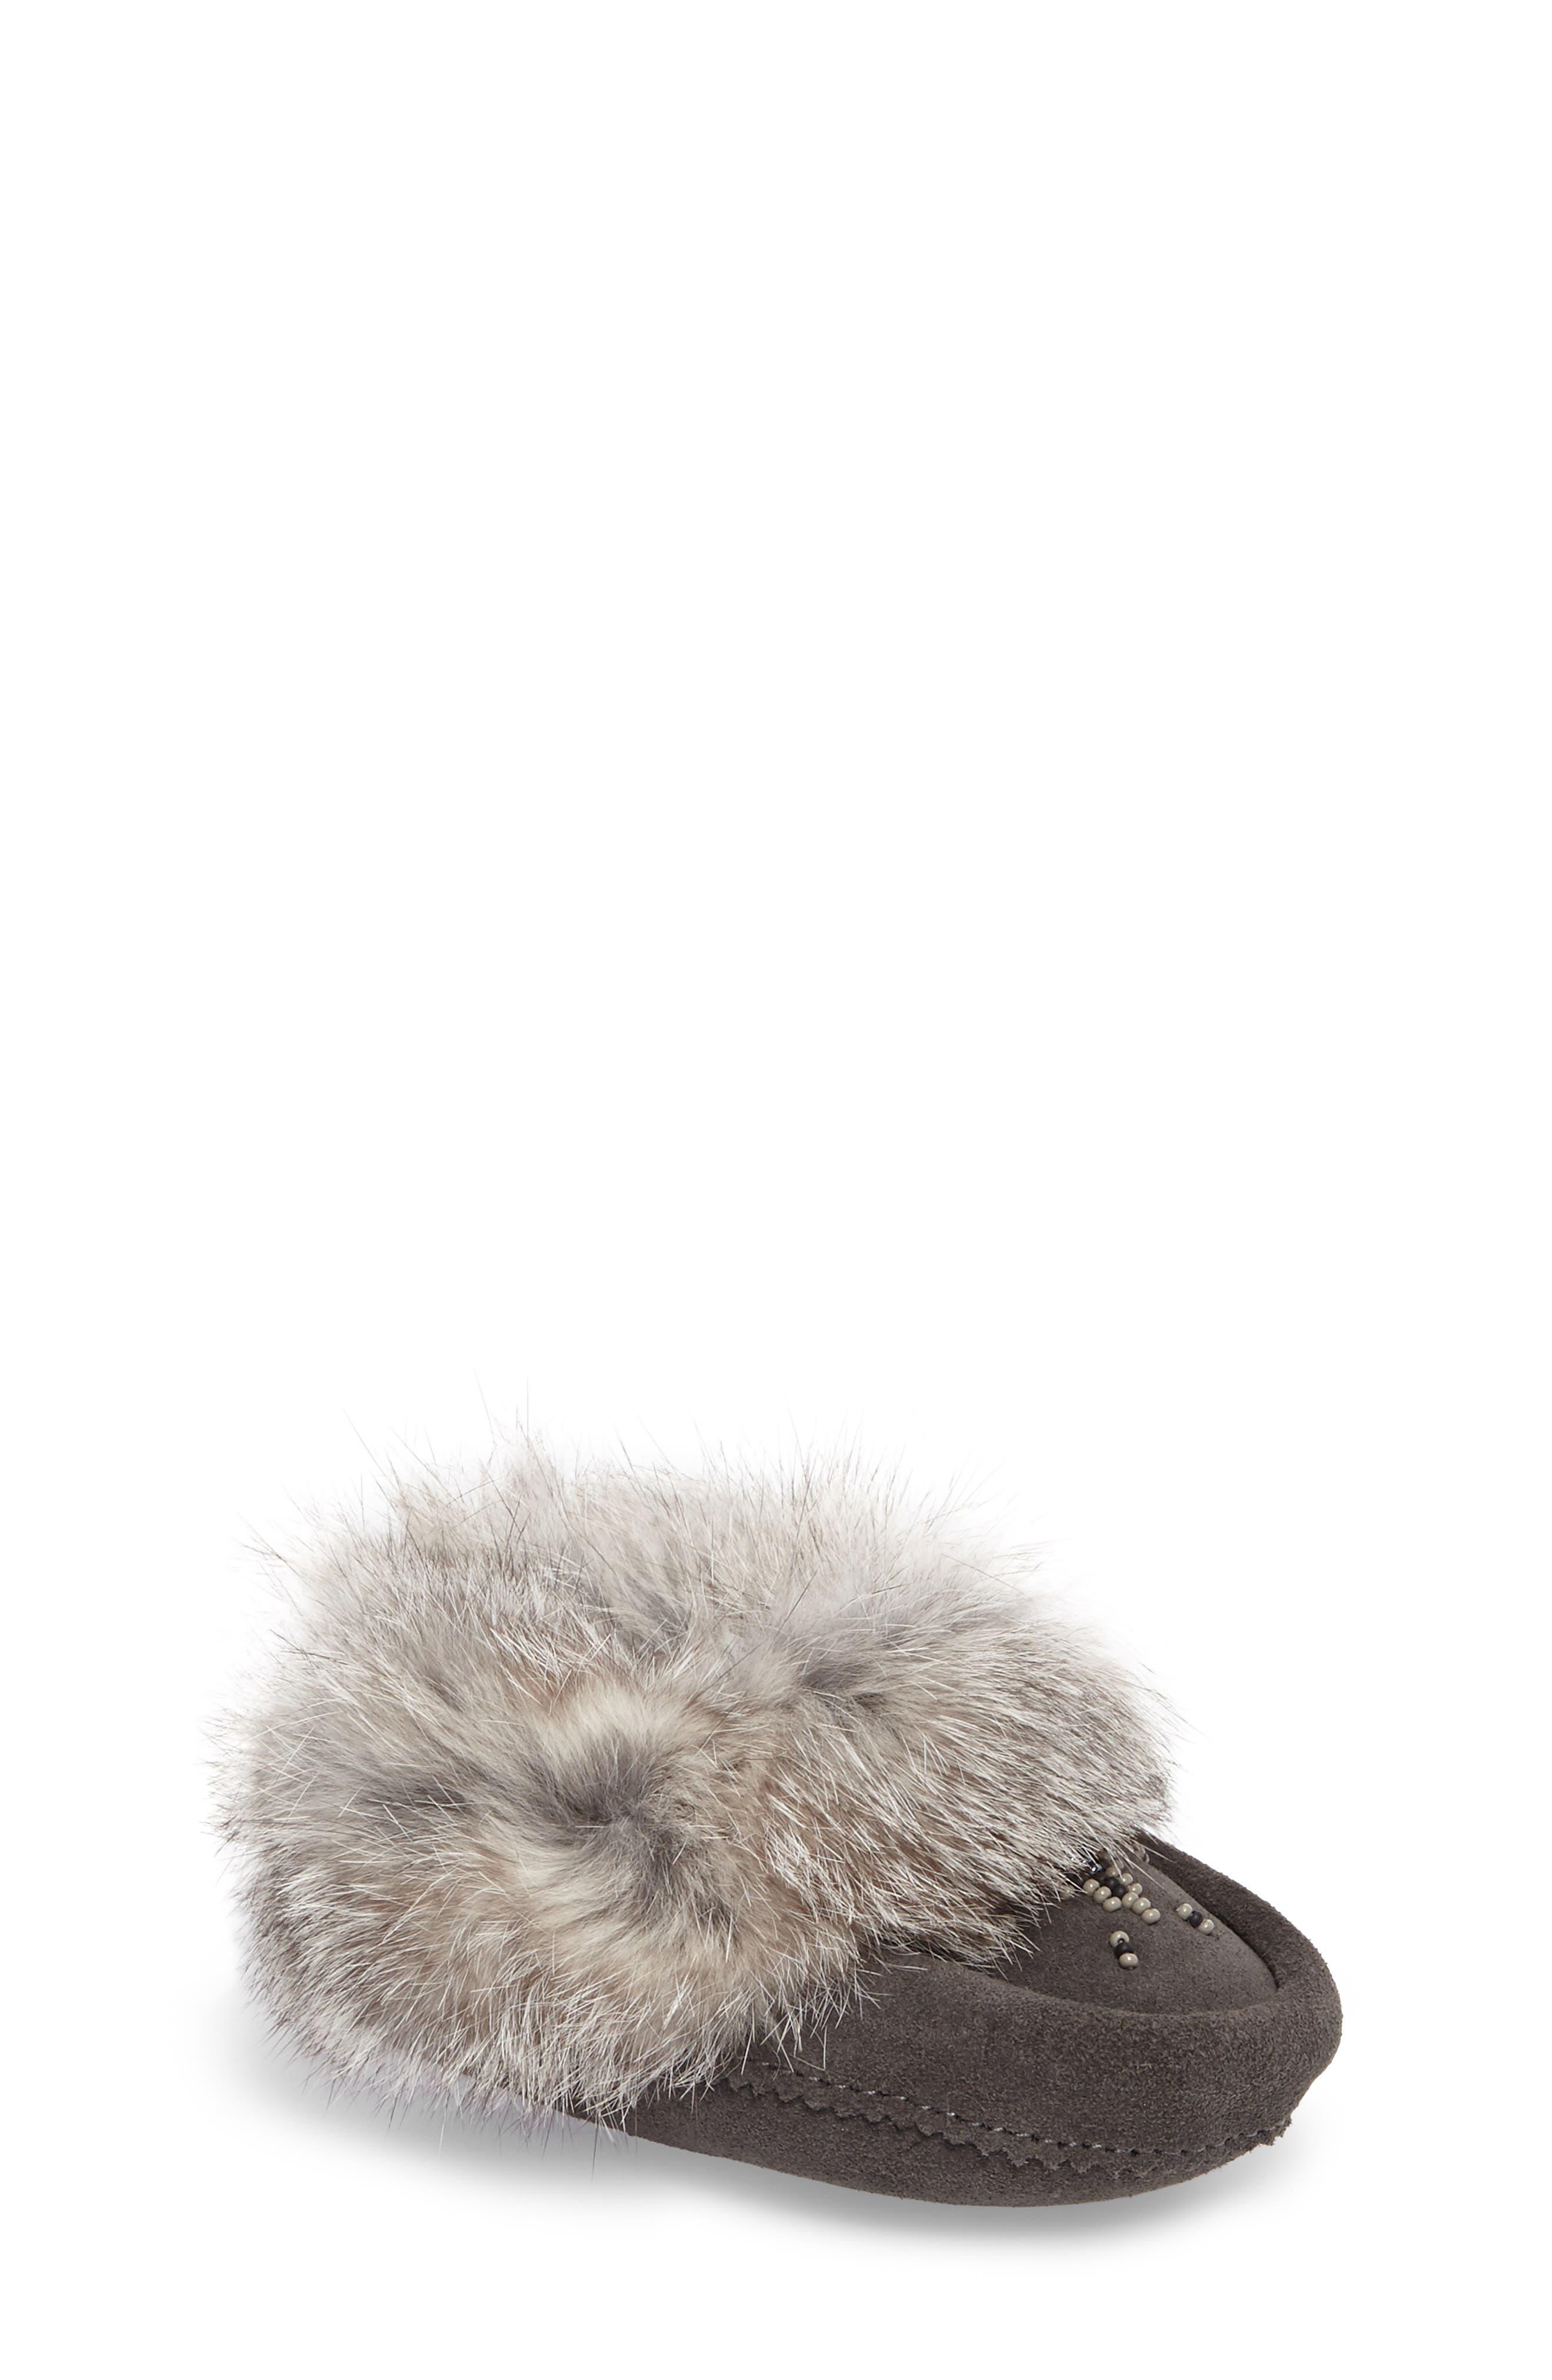 Genuine Rabbit Fur Moccasin,                         Main,                         color, Charcoal